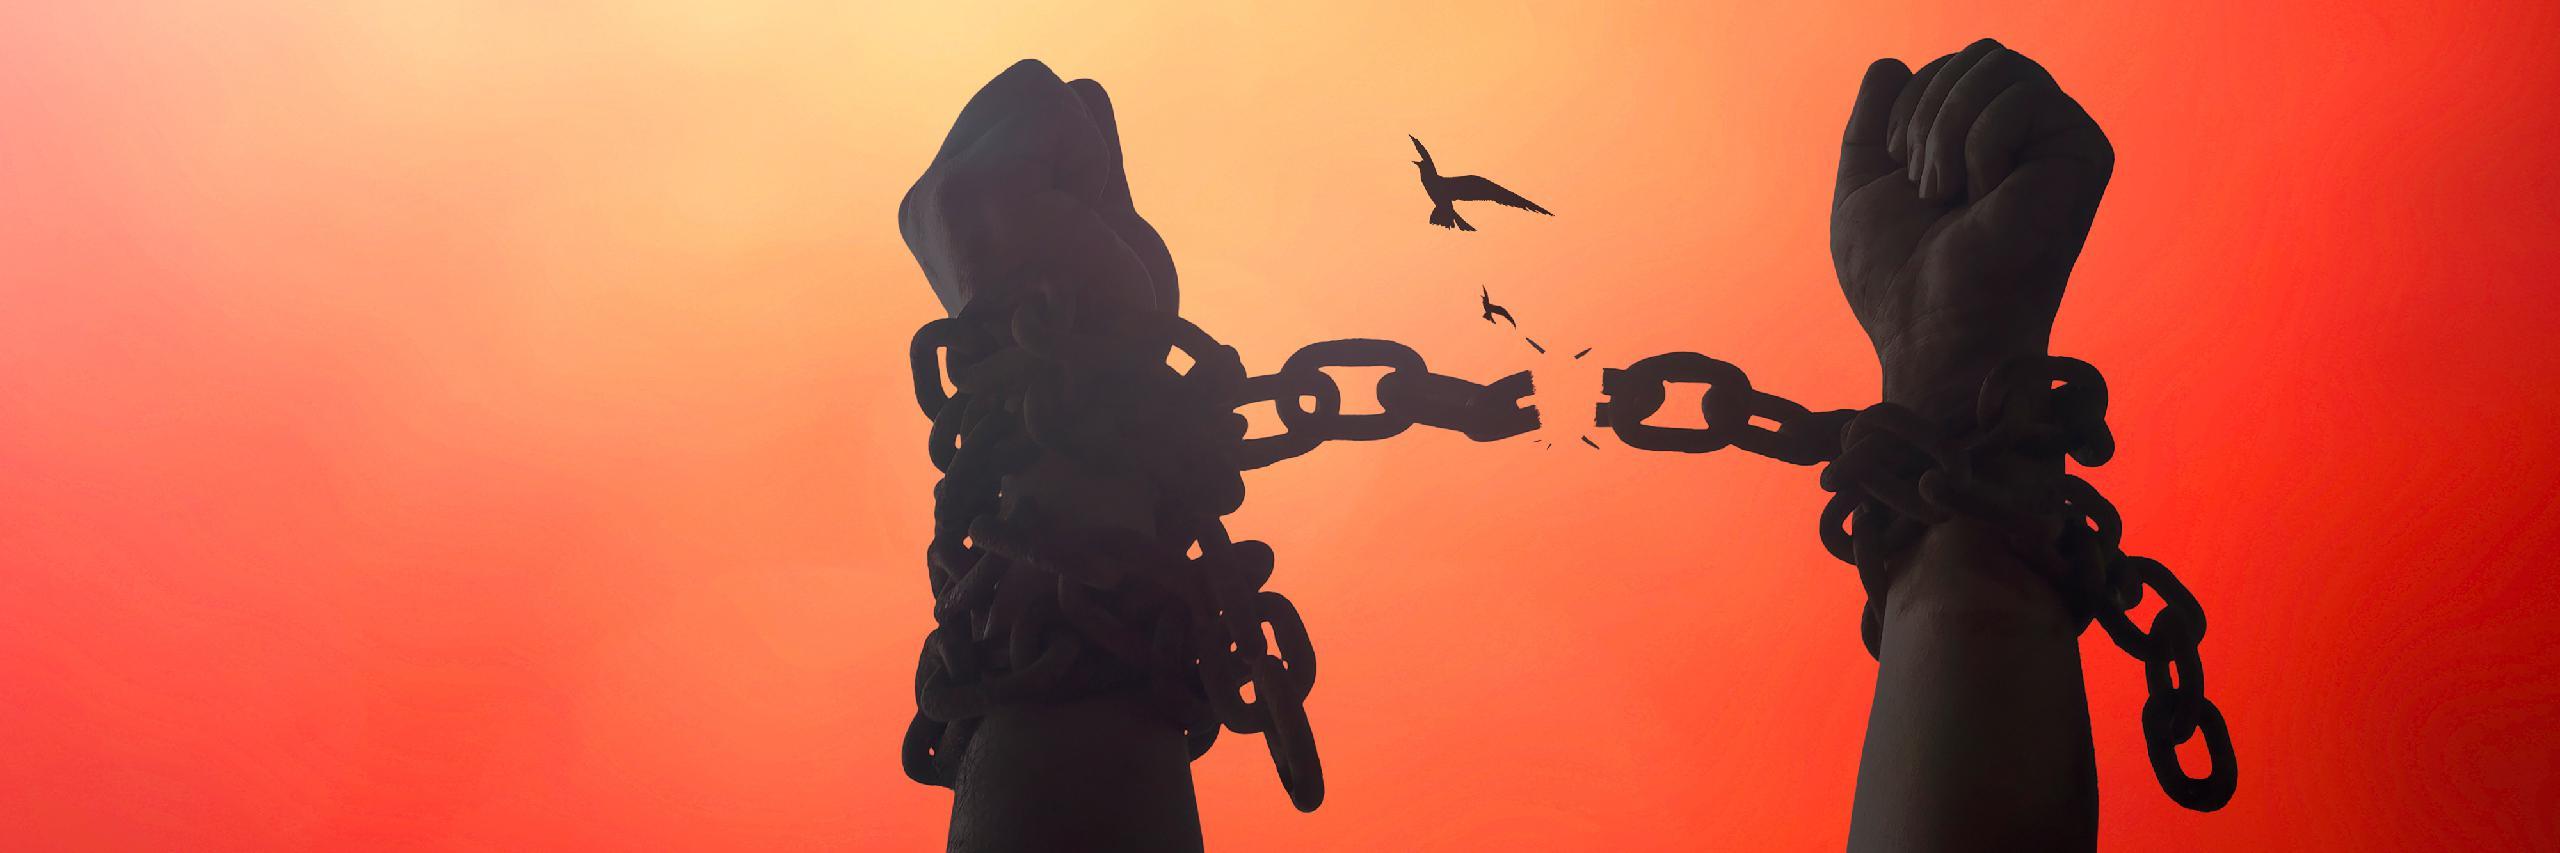 Does Islam Need Saving? An Analysis of Human Rights